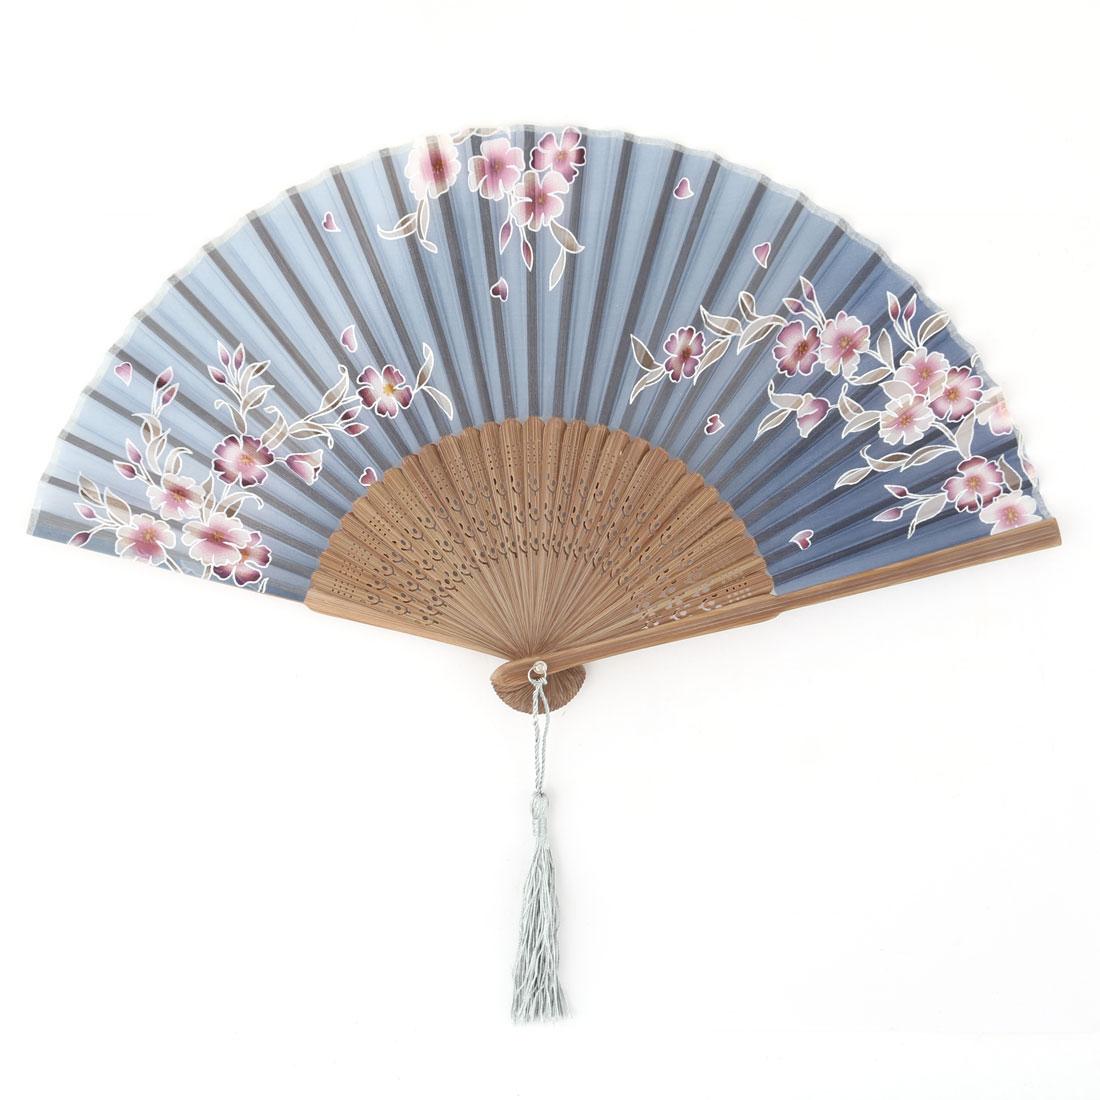 Women Dancing Bamboo Fan Ribs Floral Pattern Retro Style Folding Handing 21cm Length